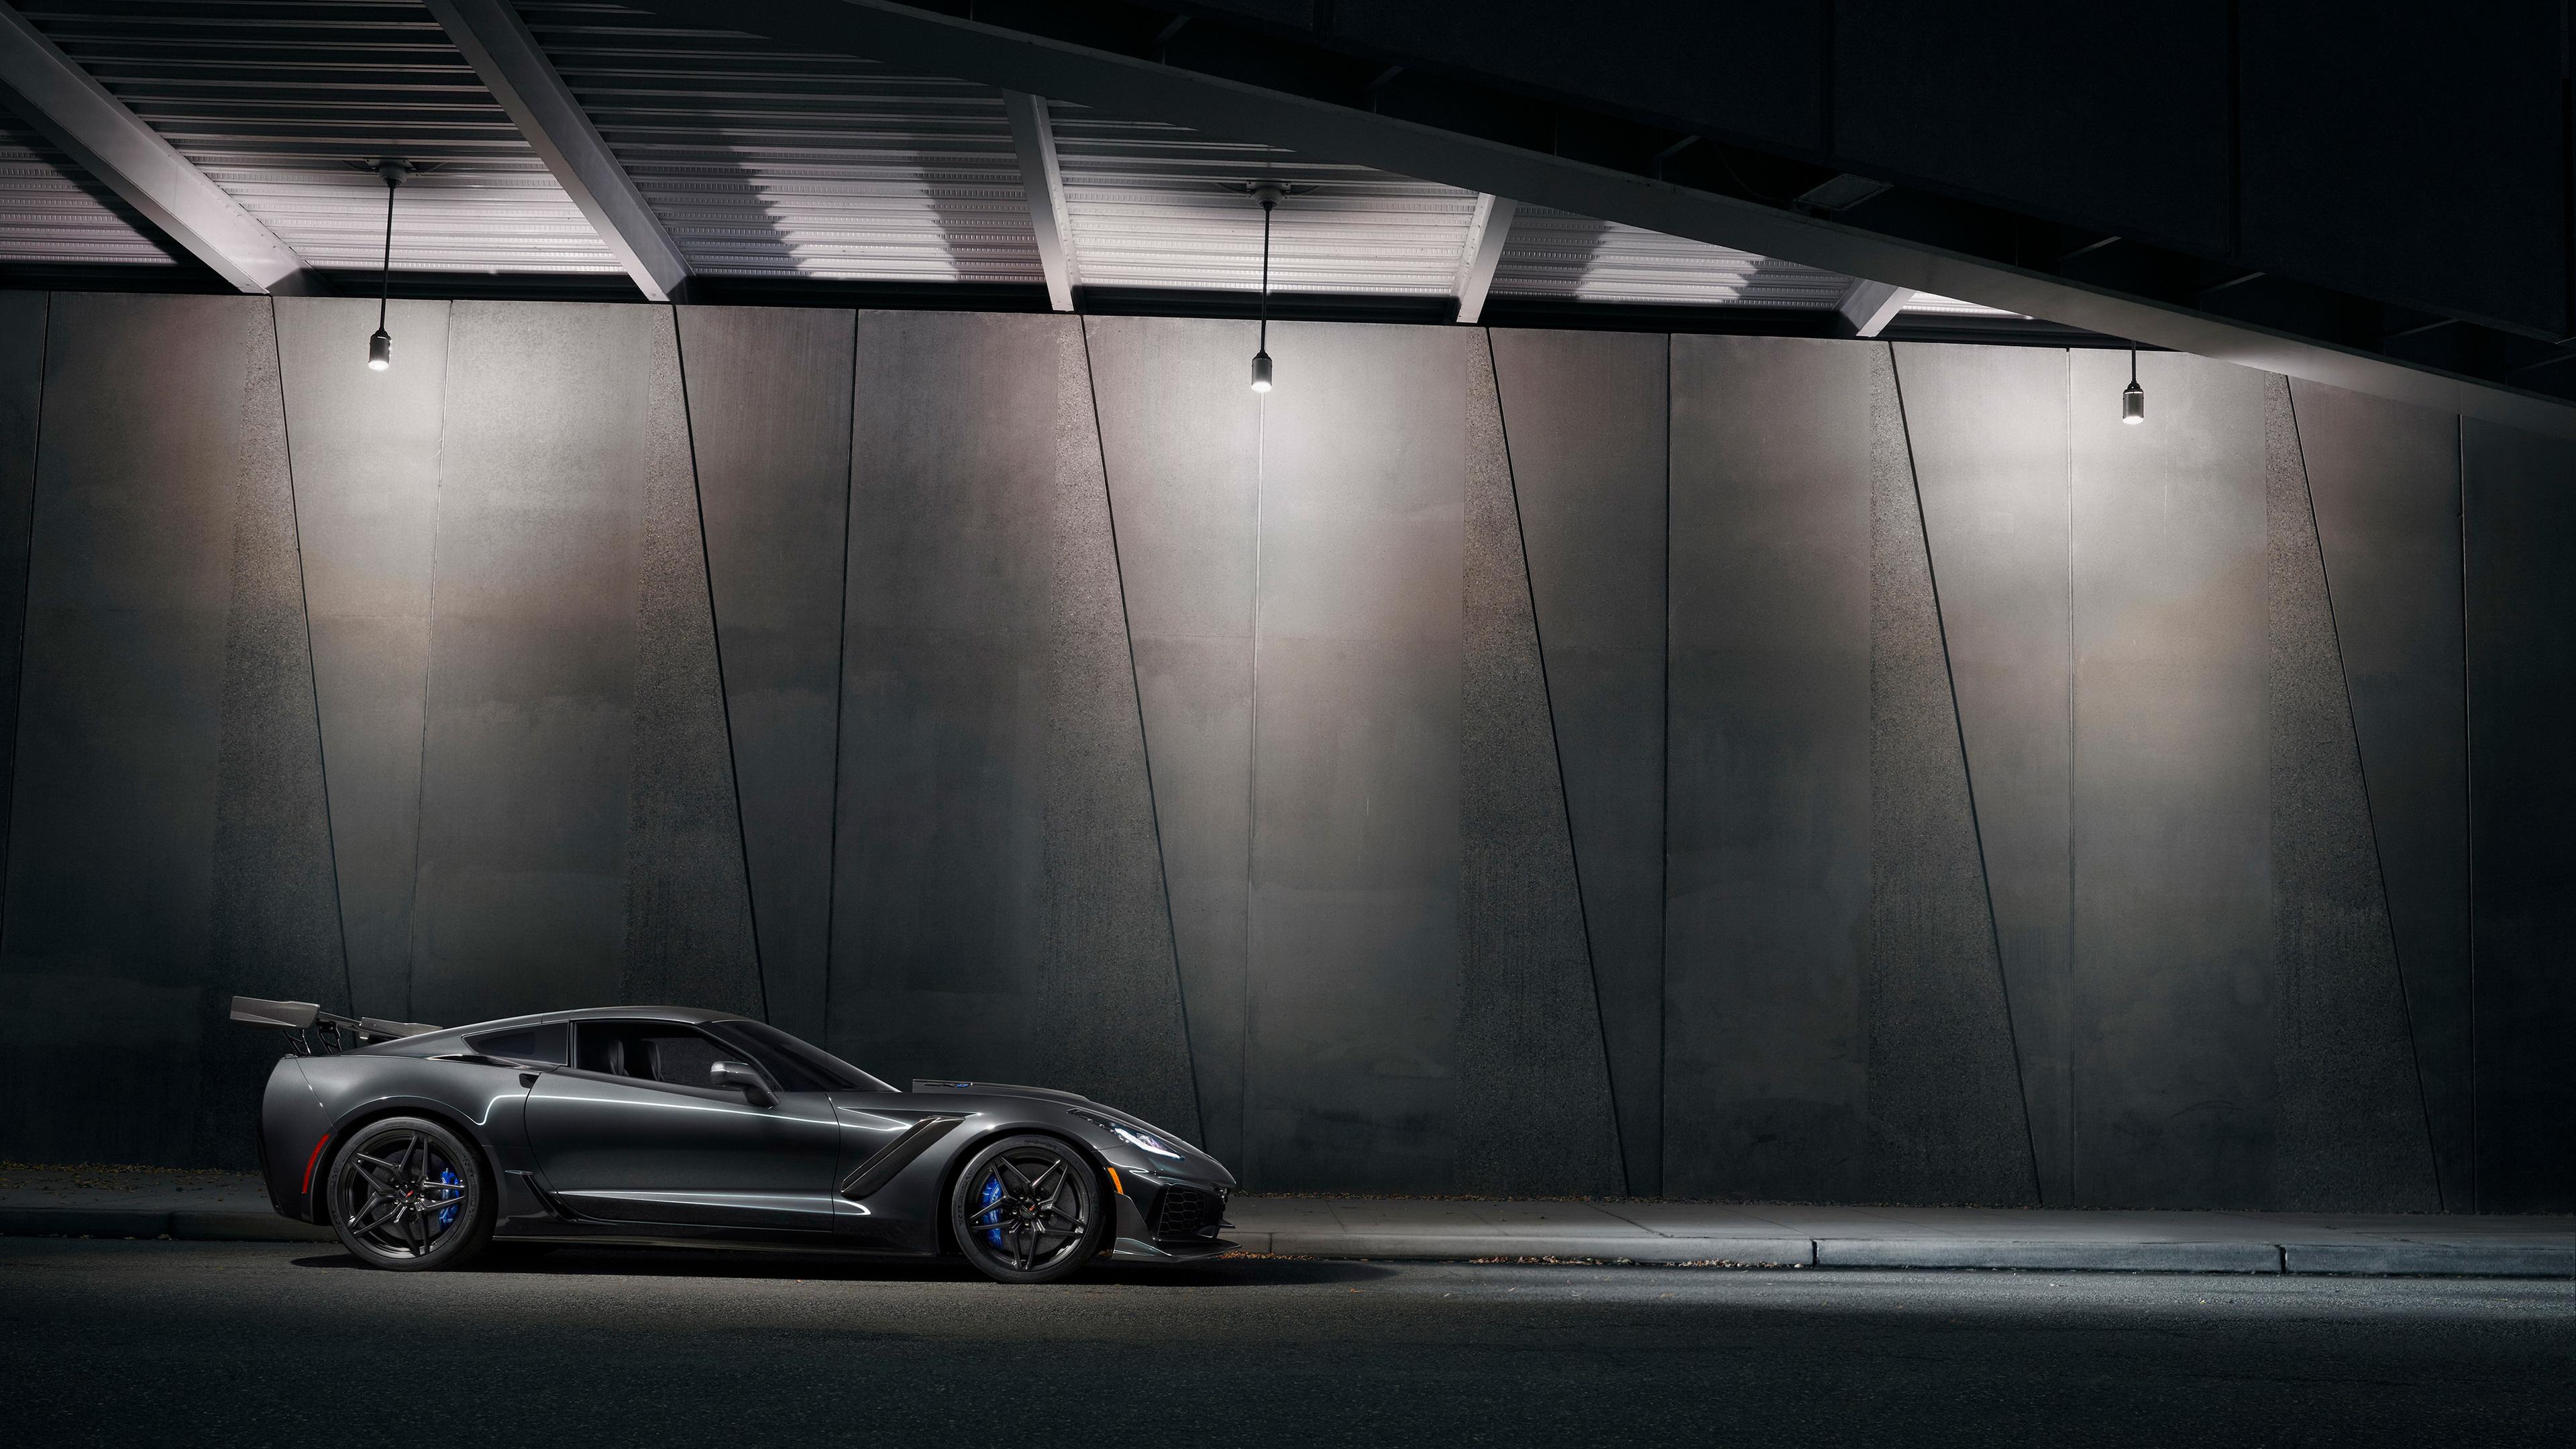 chevrolet corvette zr1 4k 2019 1539109275 - Chevrolet Corvette Zr1 4k 2019 - hd-wallpapers, corvette wallpapers, chevrolet wallpapers, chevrolet corvette zr1 wallpapers, cars wallpapers, 4k-wallpapers, 2019 cars wallpapers